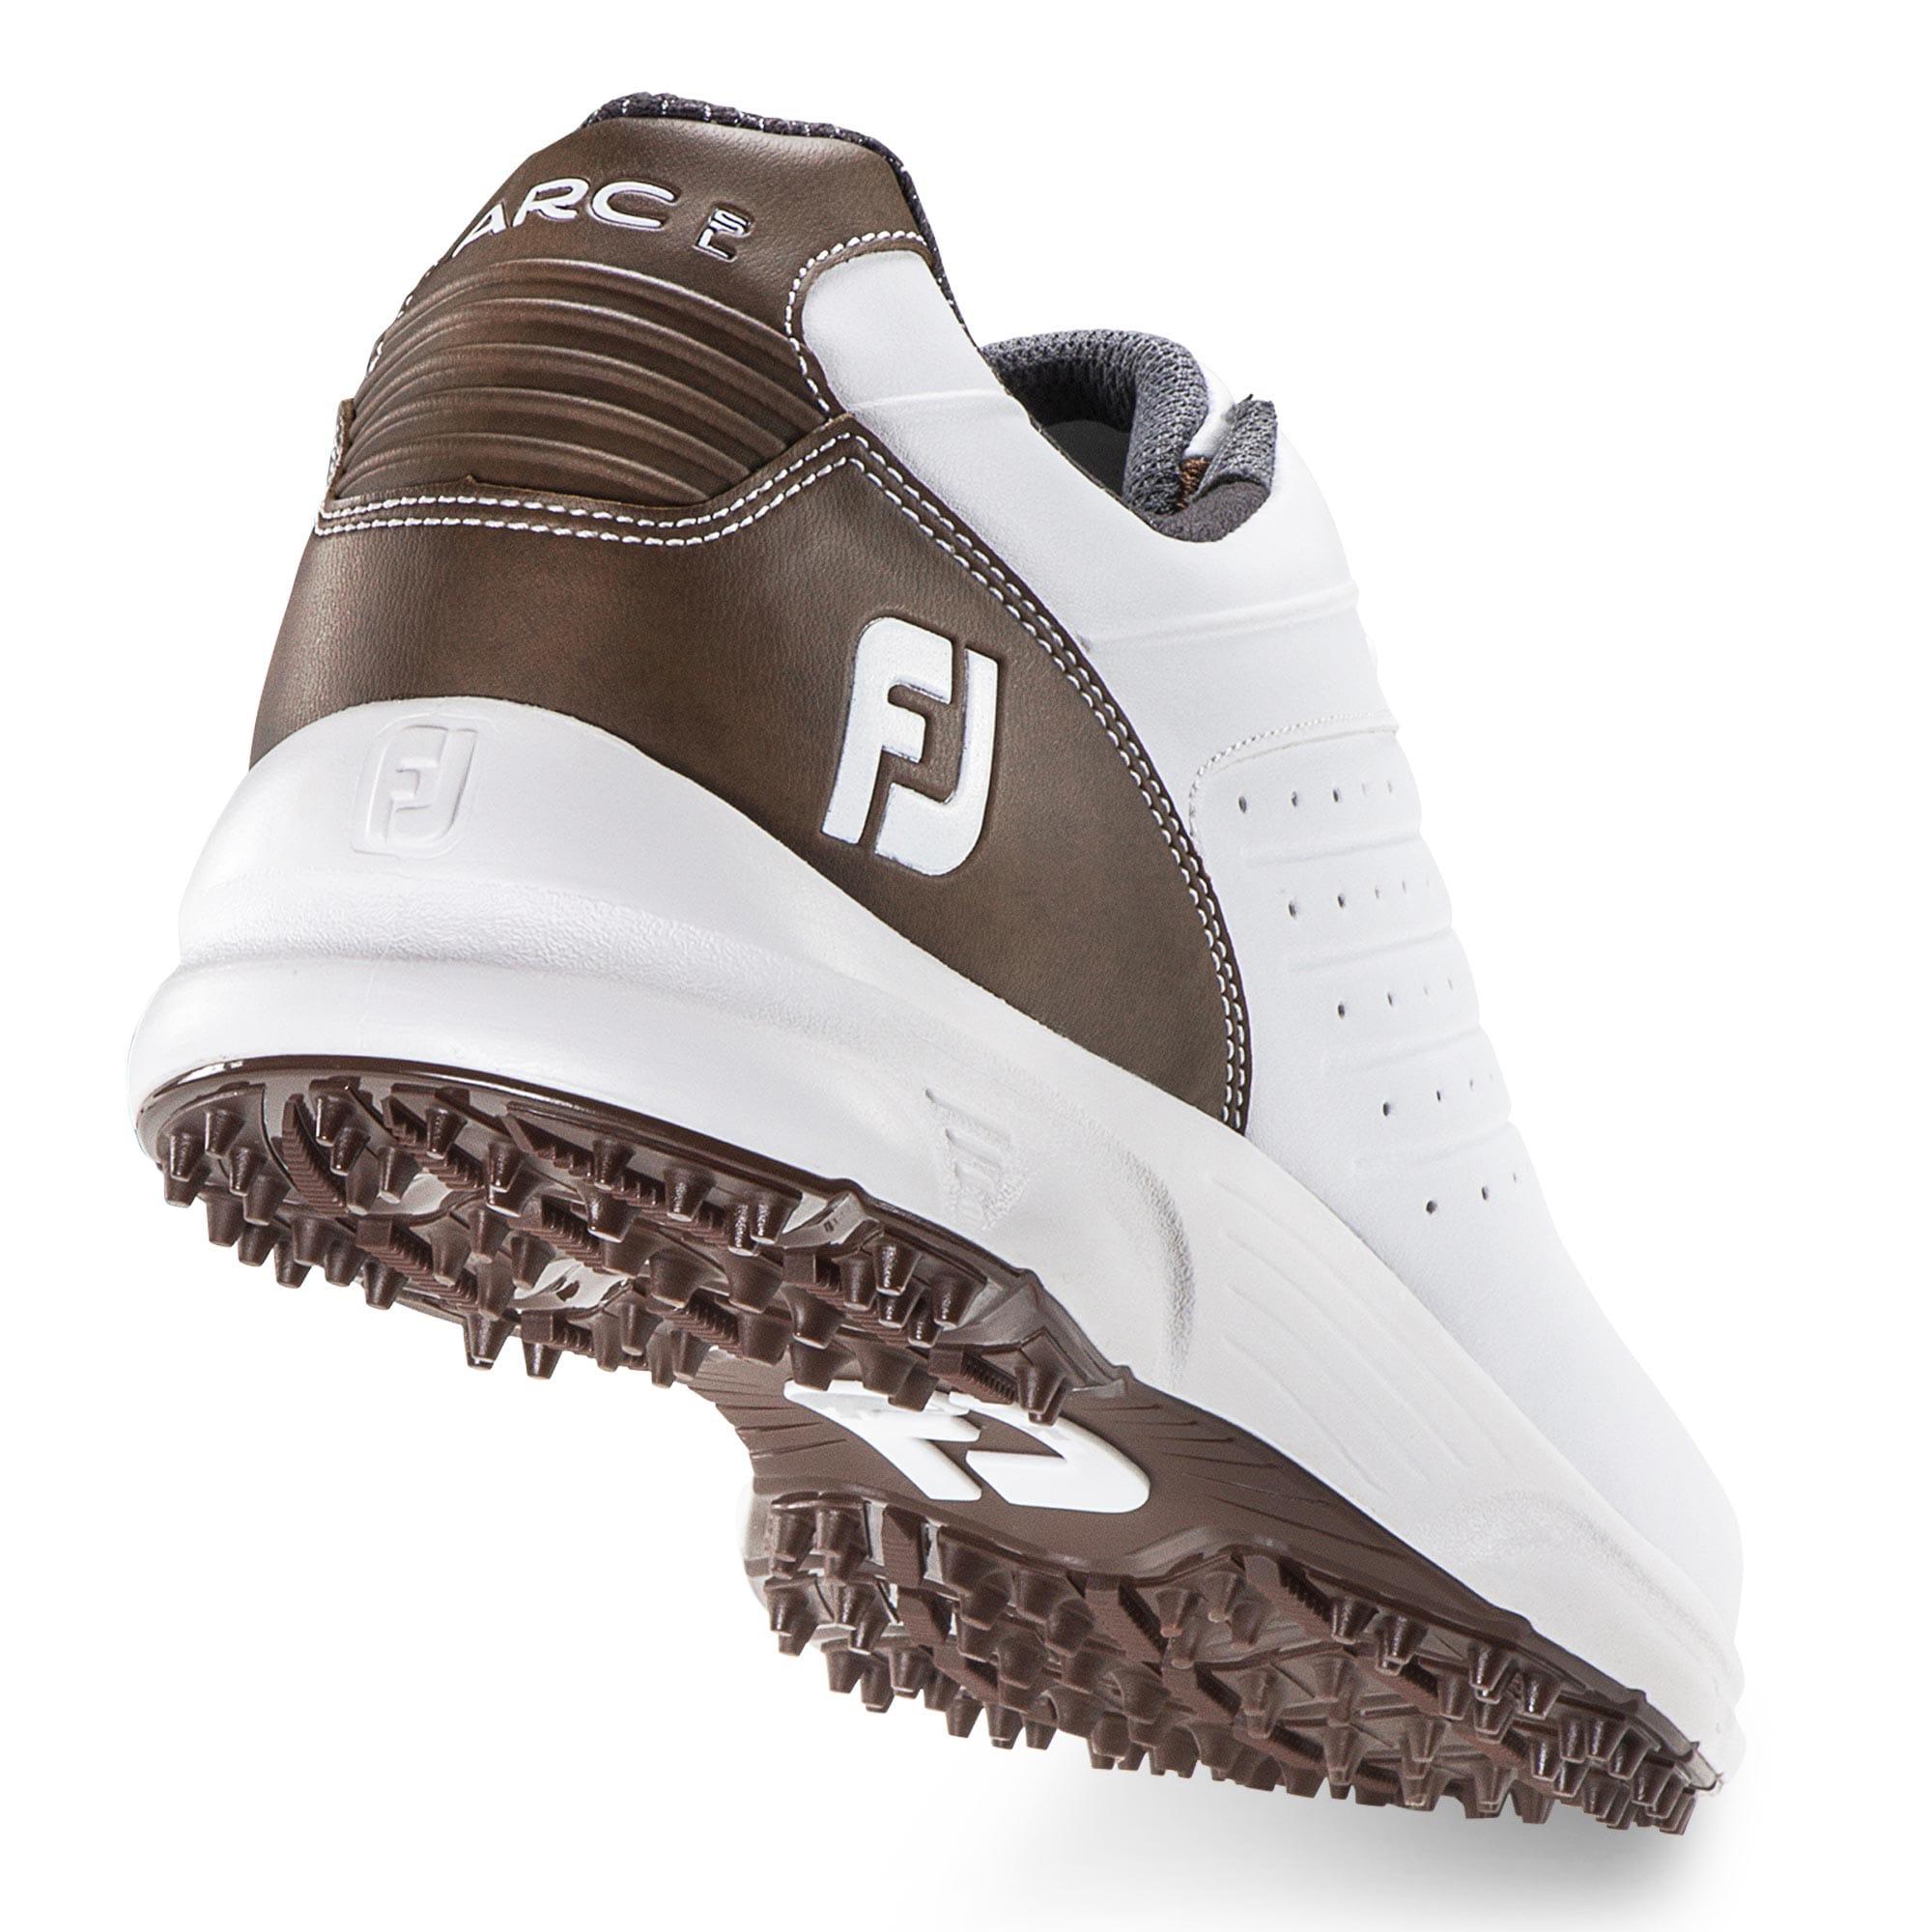 FJ ARC SL Golf Shoes | FootJoy